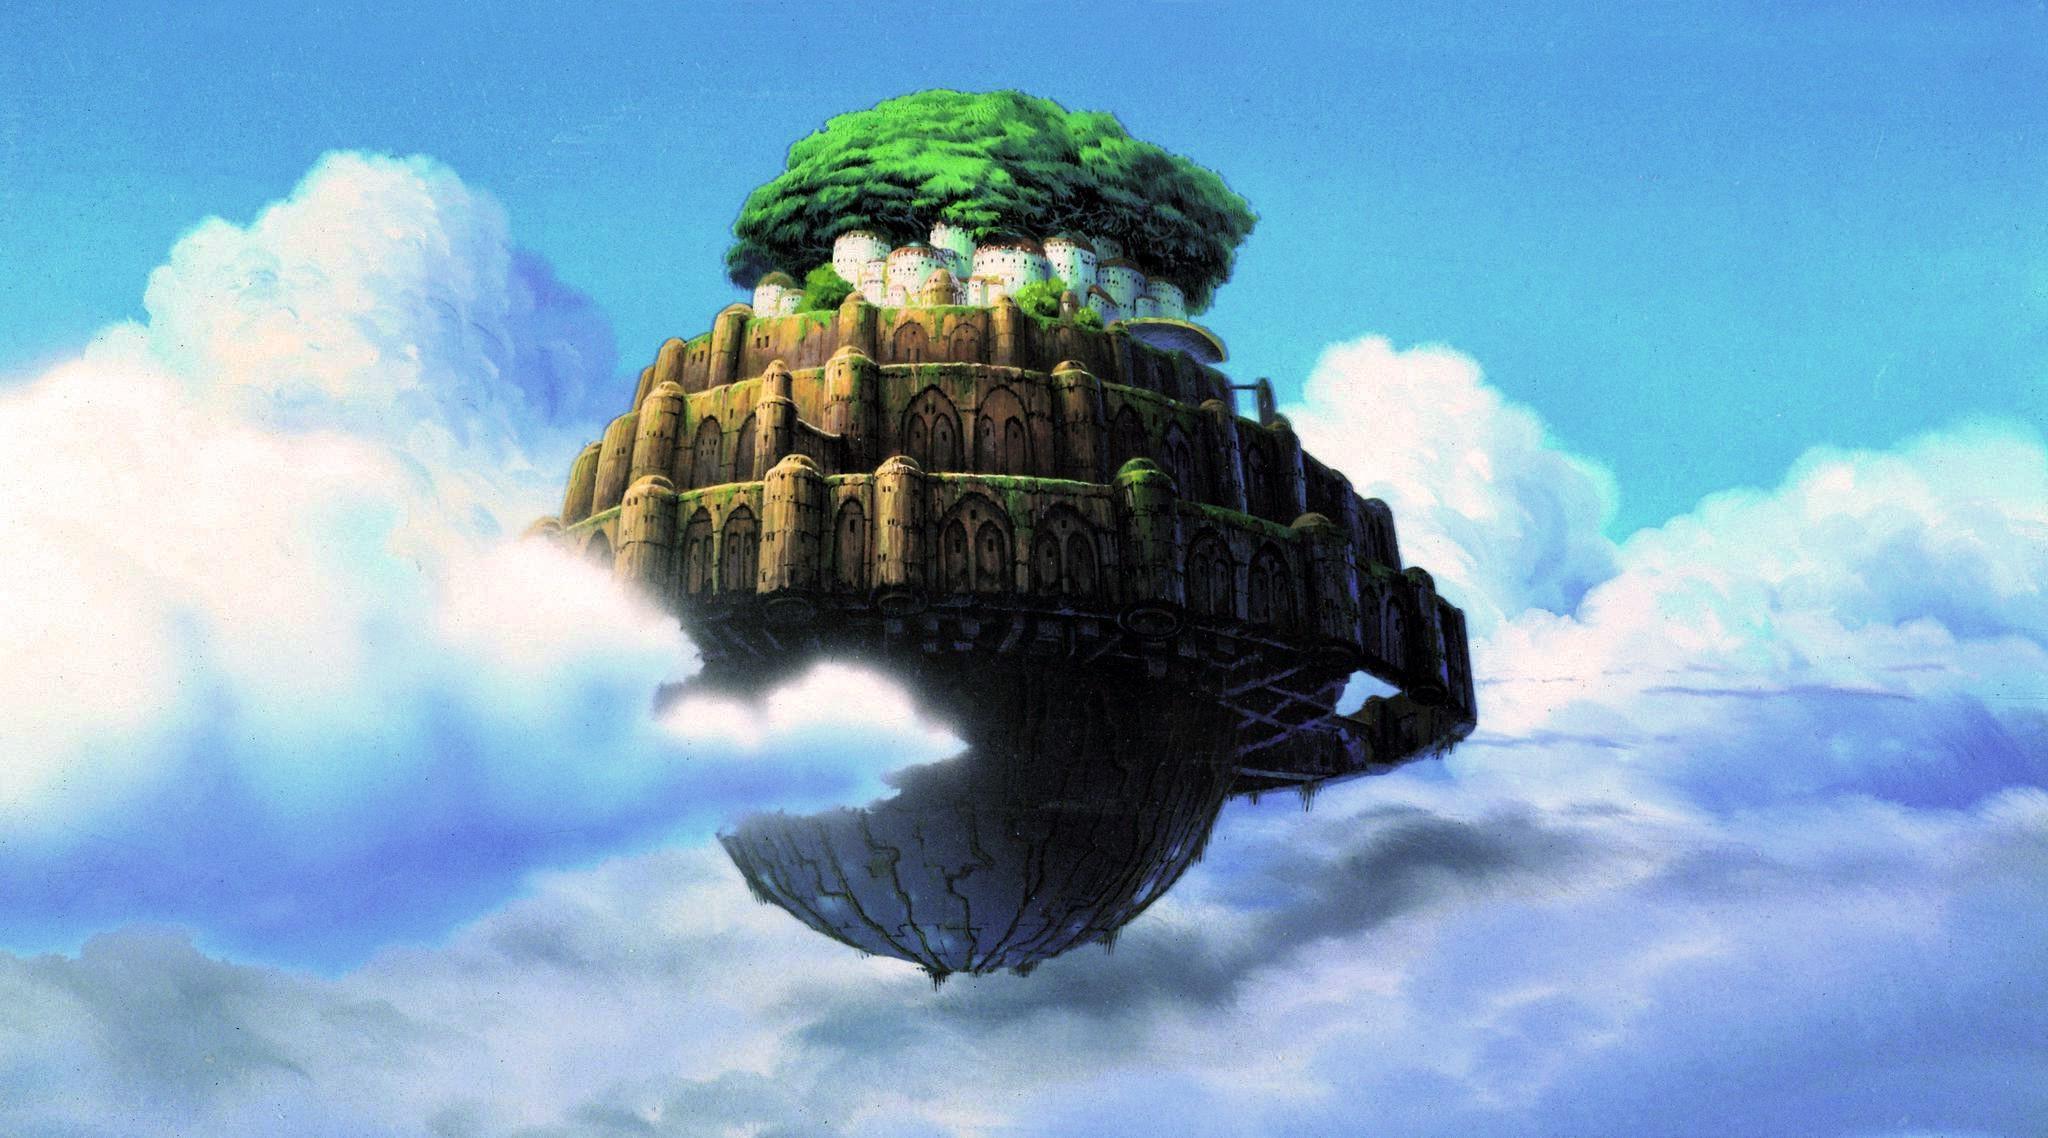 Anime Sky Hayao Miyazaki Castle In The Screenshot Atmosphere Of Earth 2048x1138 Px